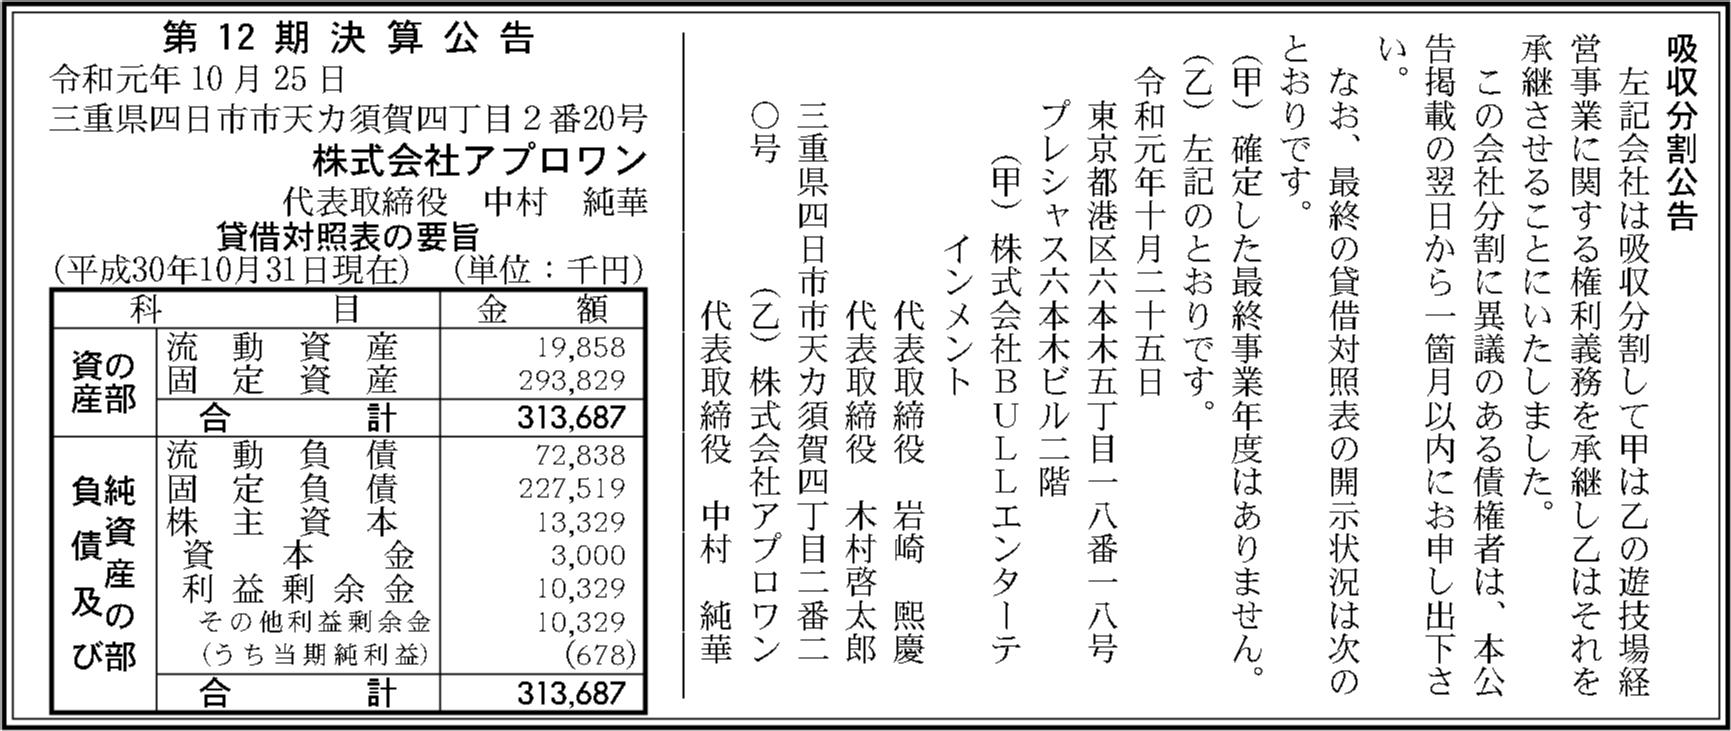 0118 bb082e92fcbee6aeb56f42fd0ff834b9a092ef55898a91e6b1e7c472820f3a5d46beadb9ab94cd6b7db4bbb3c7230bace7deb25f233e1b56d613222f38cf3216 02